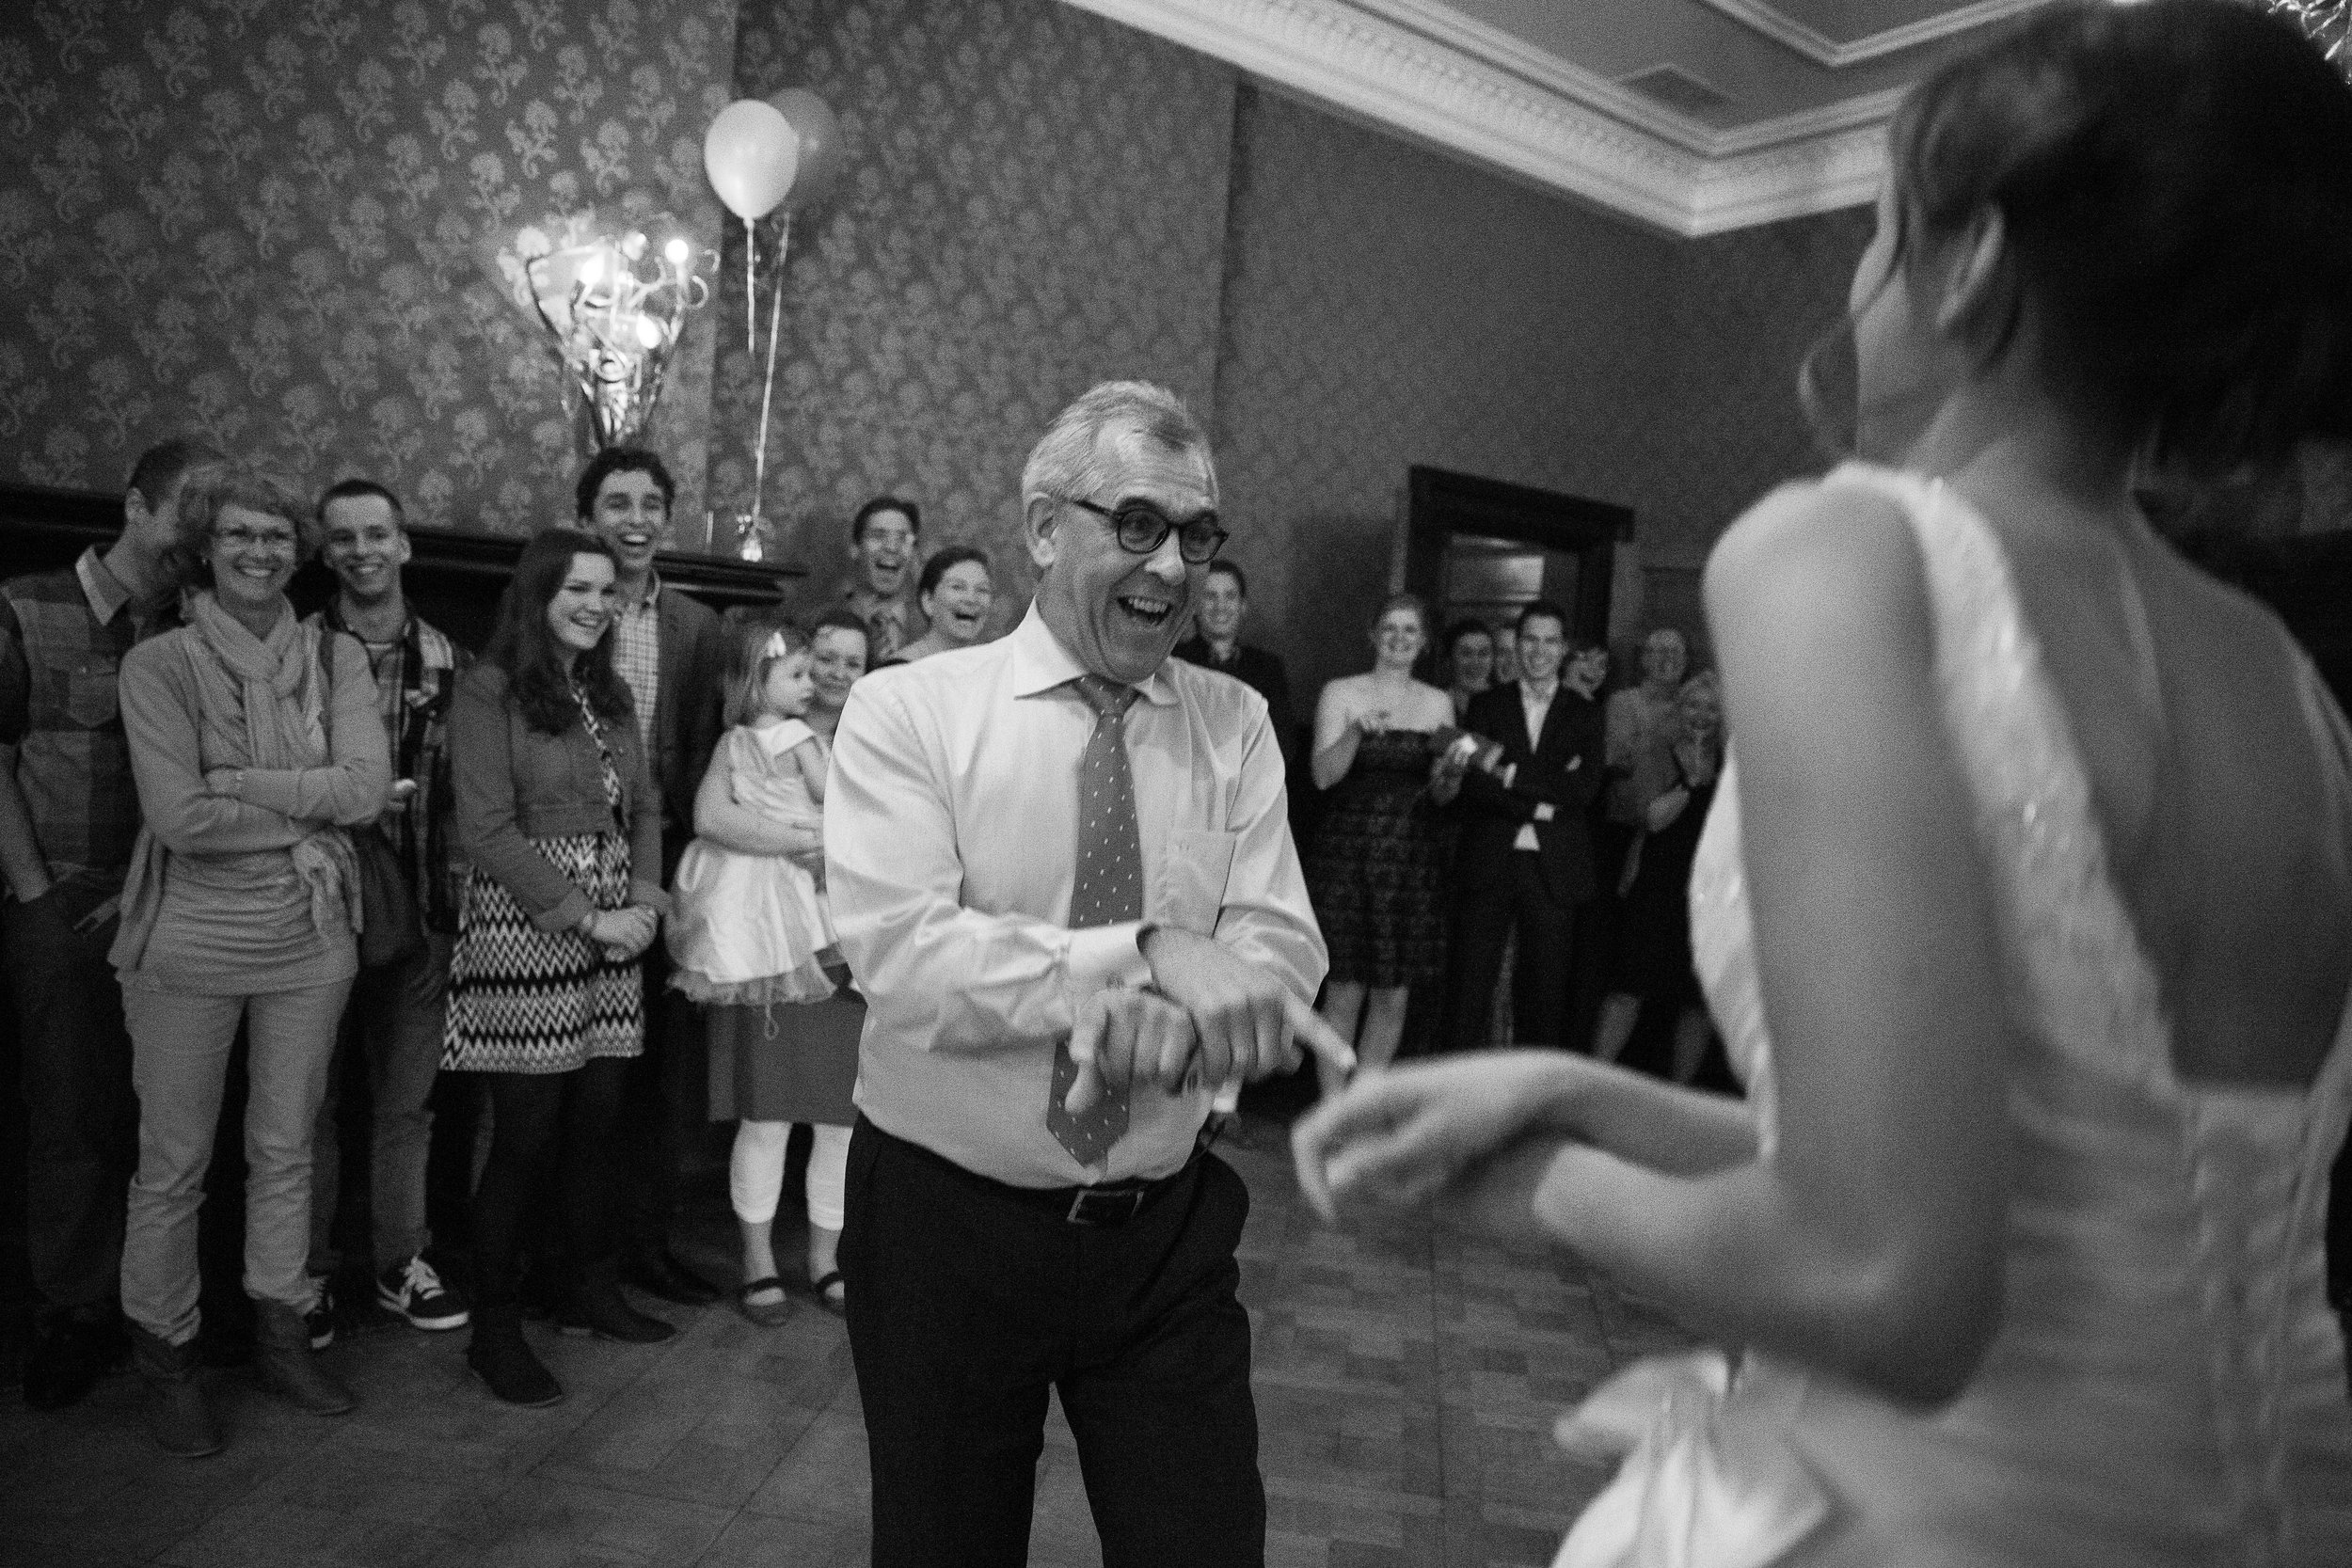 bruidsfotografie-trouwreportage-huwelijksfotografie-bruidsfotograaf-feestfotografie-Elise en Maarten-147.jpg